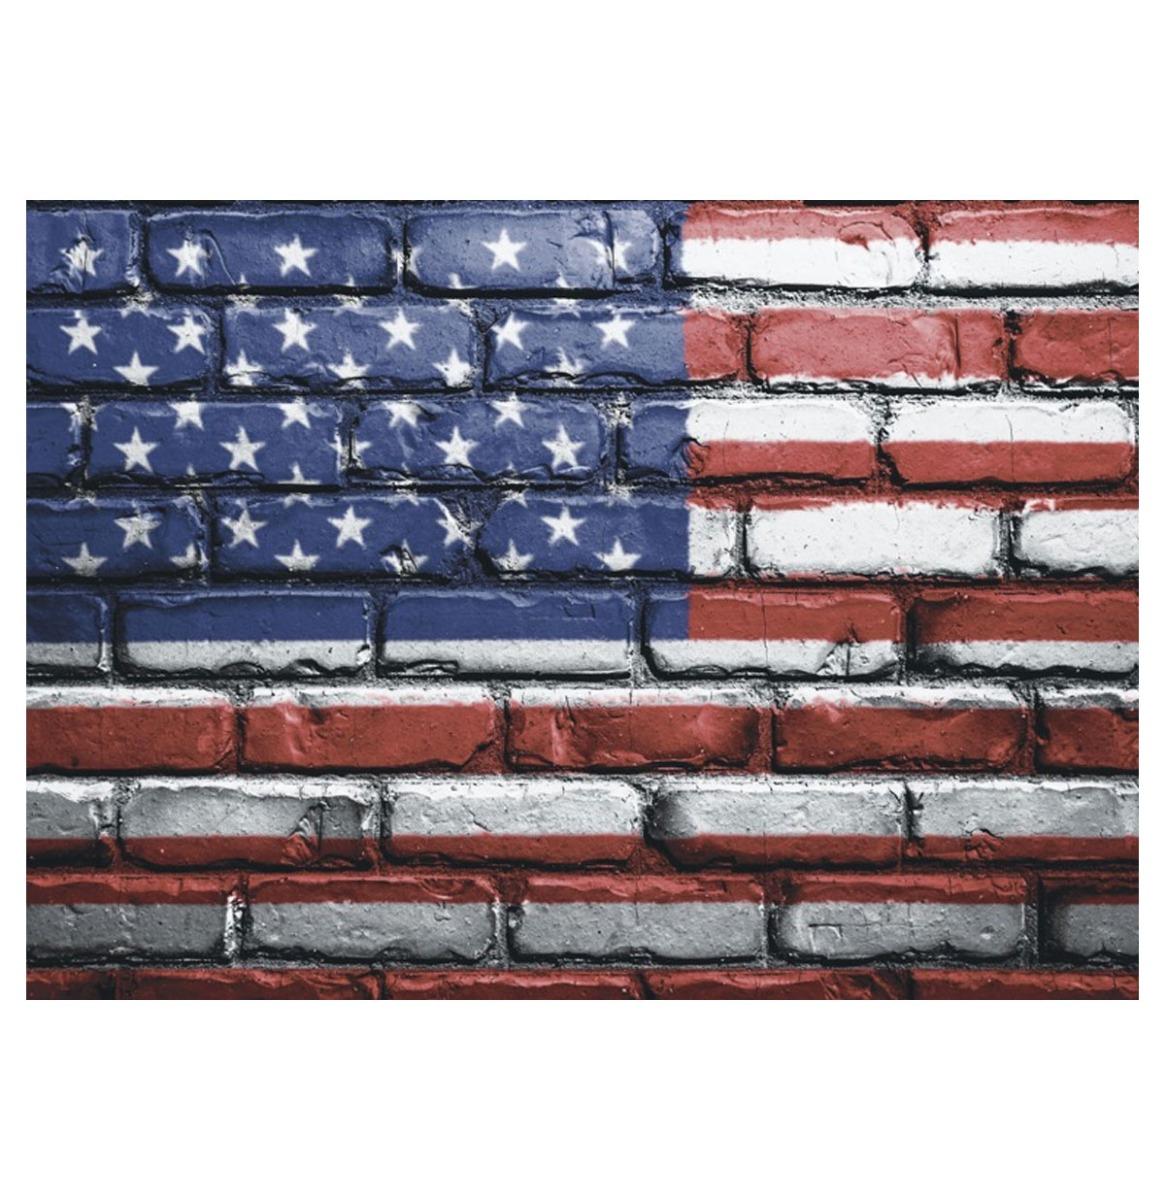 Usa Flag Painted On Brick - Metalen Bord Met Reliëf - 43 x 31 cm